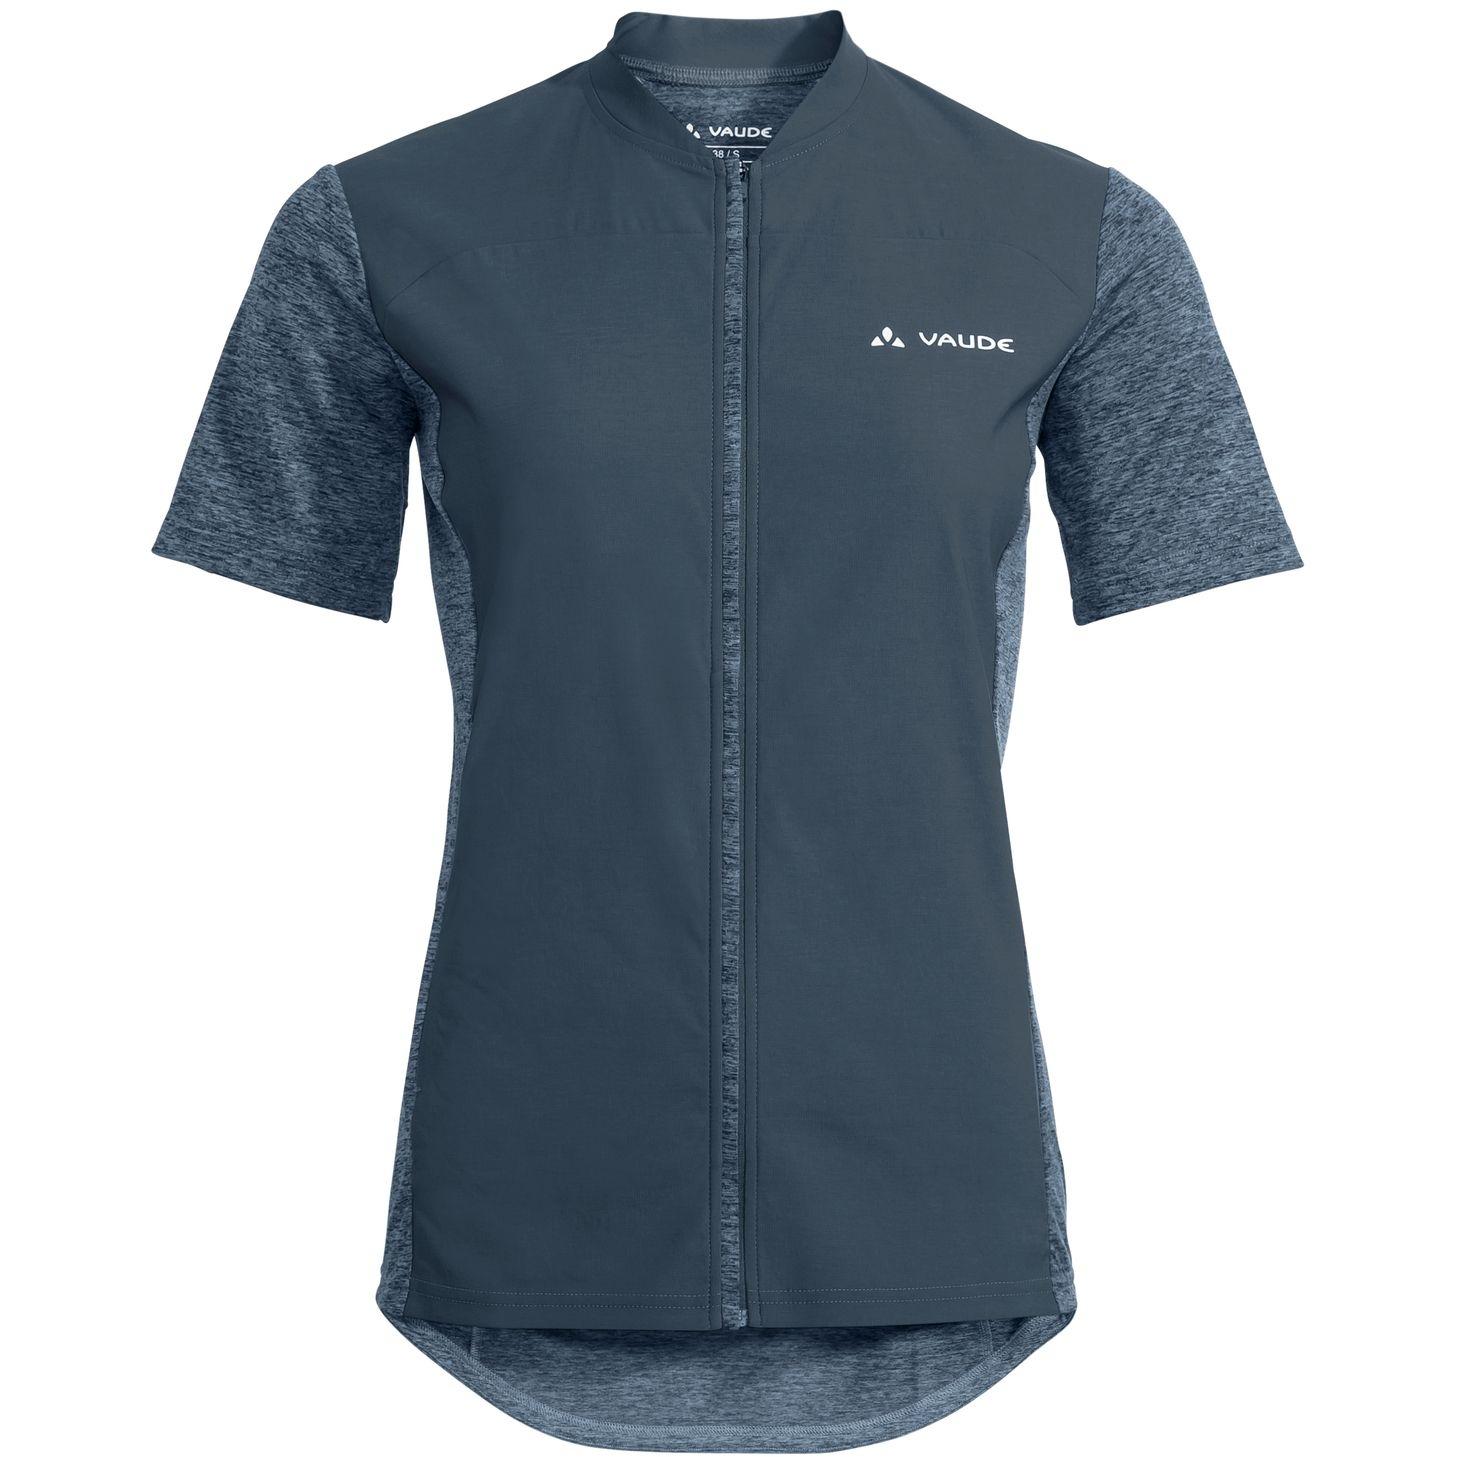 Vaude Qimsa Wind Damen T-Shirt - steelblue